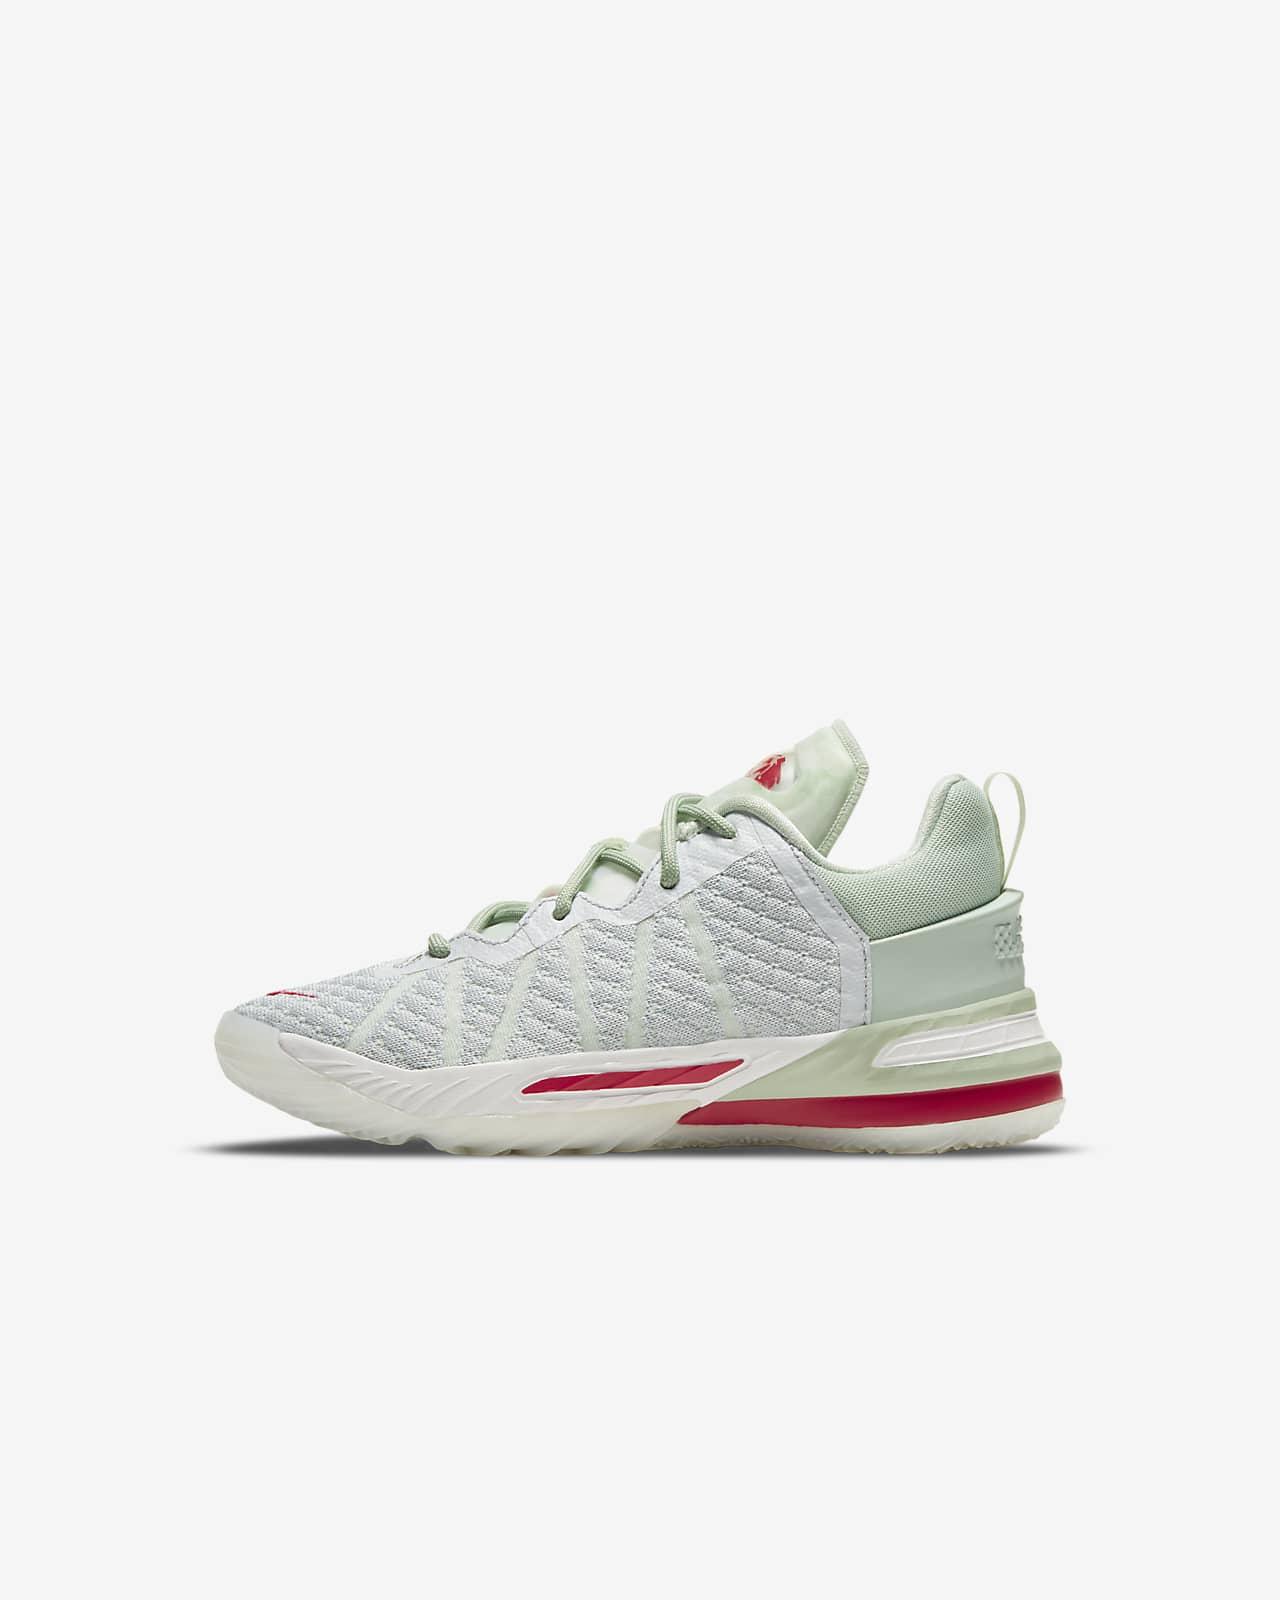 LeBron XVIII NRG (PS) 幼童运动童鞋